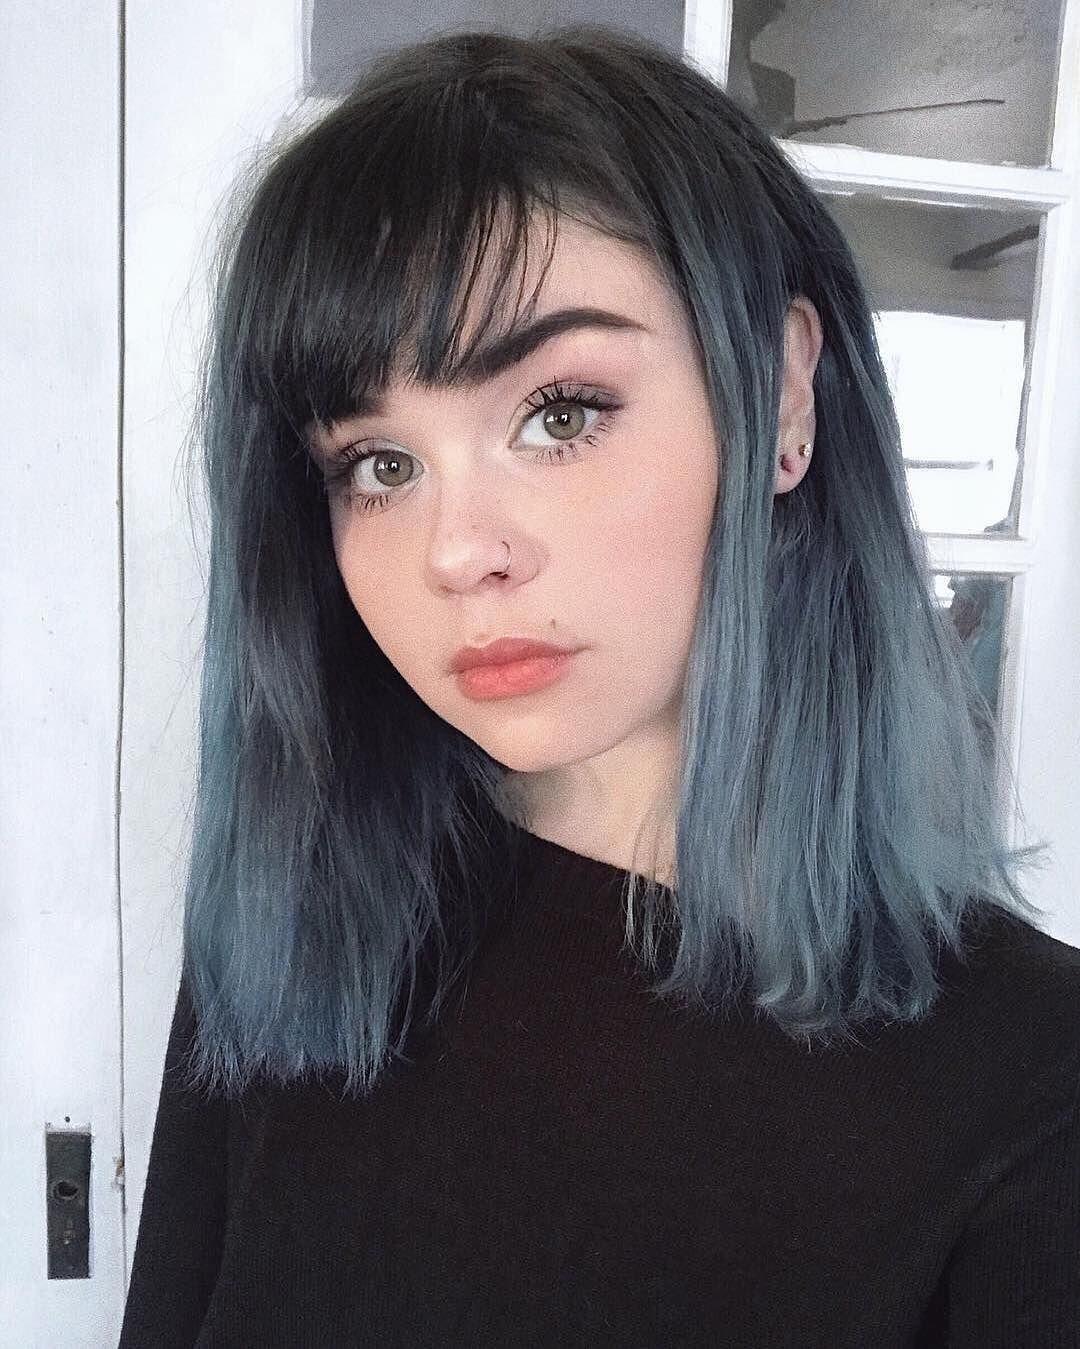 Dyed Blue Front Streaks In 2020 Hair Color Streaks Blue Hair Streaks Dyed Hair Blue